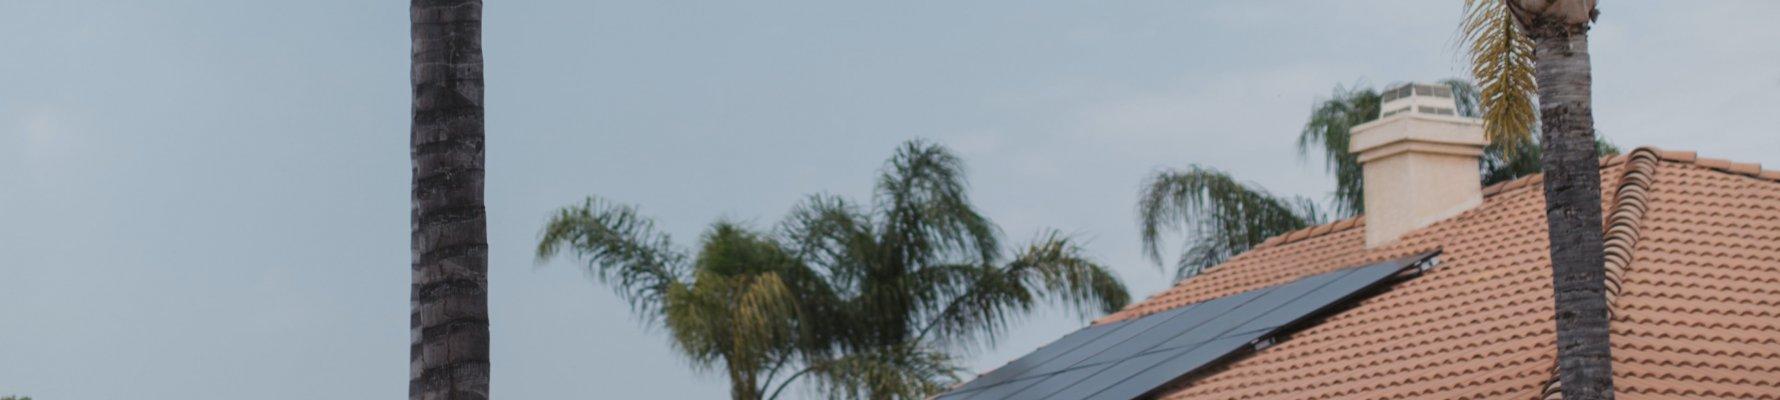 vivint-solar-fk2f9p7cpuk-unsplash